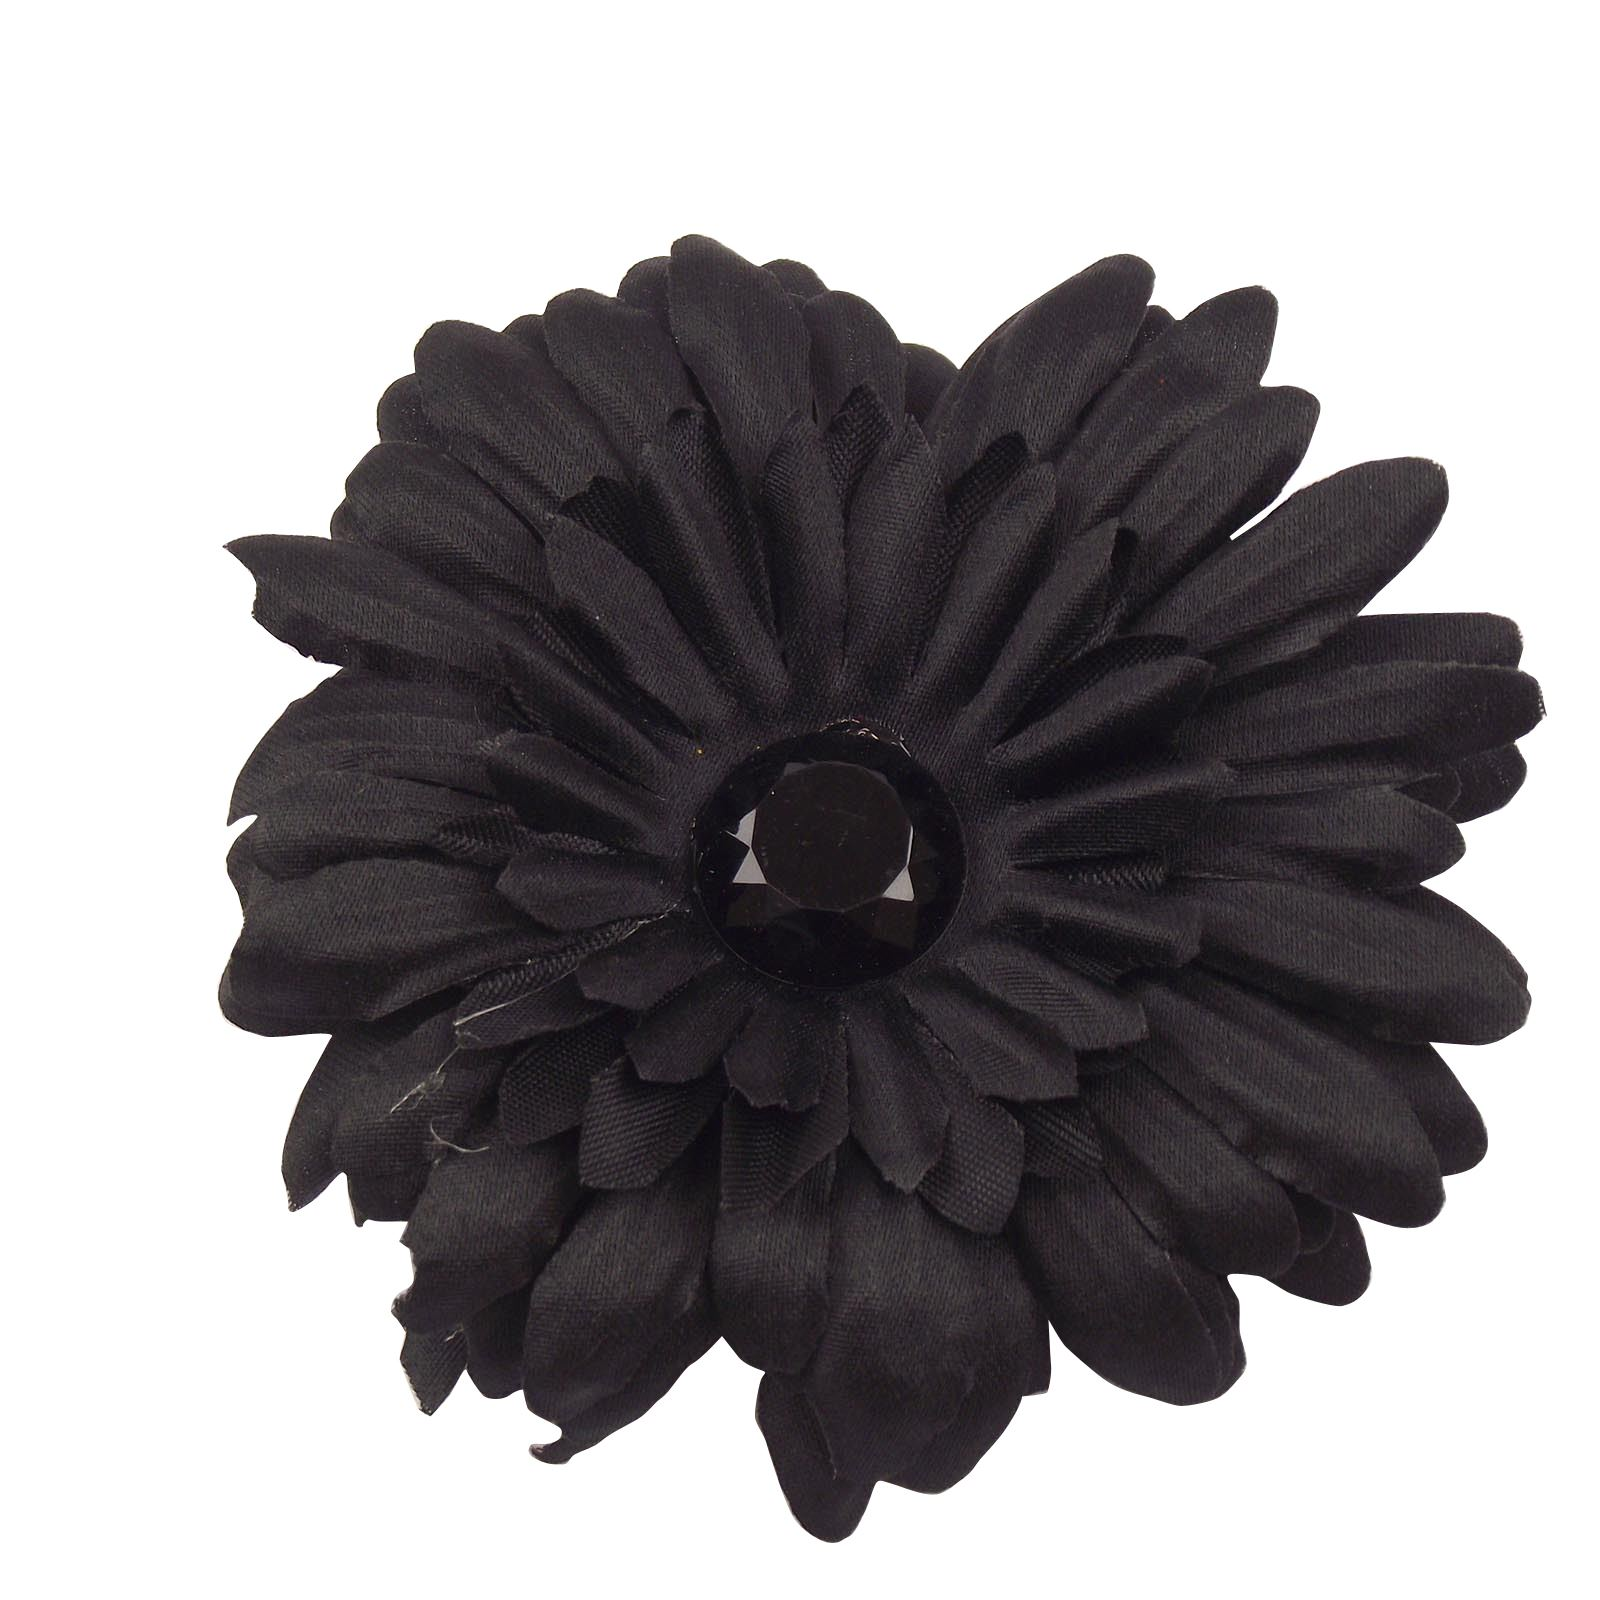 3 In 1 Gerbera Hair Clip Pin Badge Buy 3 Get 4th Free Head Flower